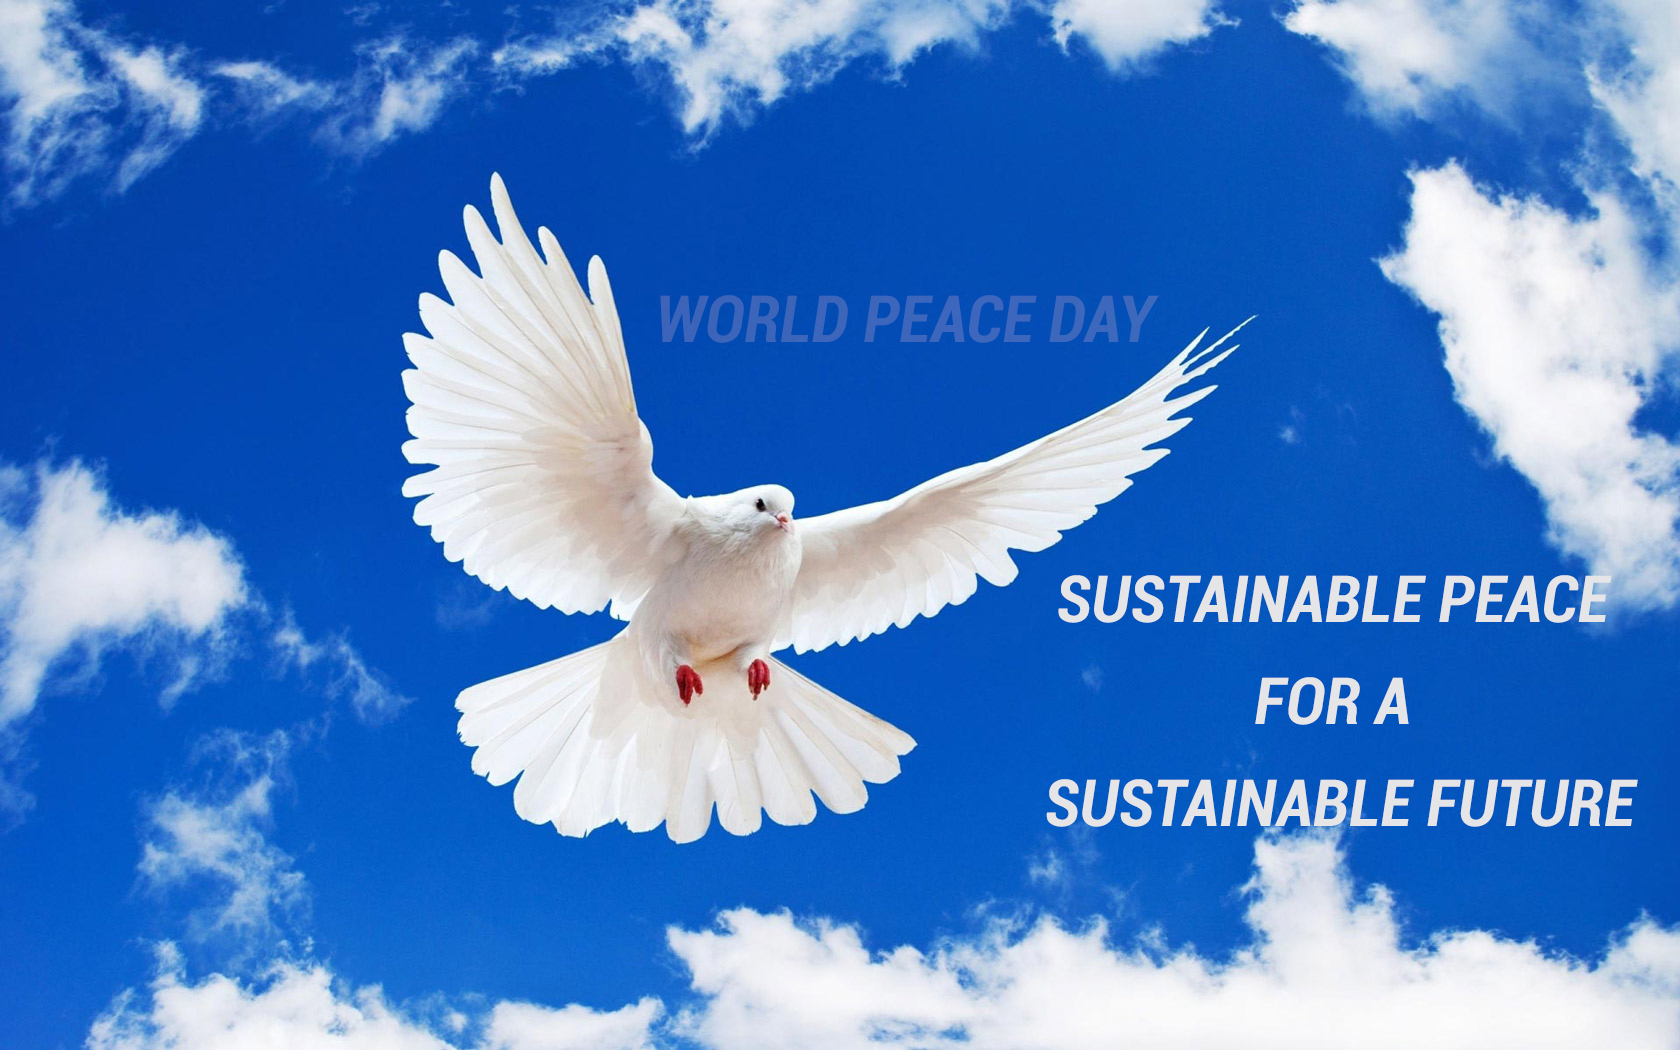 International Day of Peace Wallpaper 10   1680 X 1050 stmednet 1680x1050